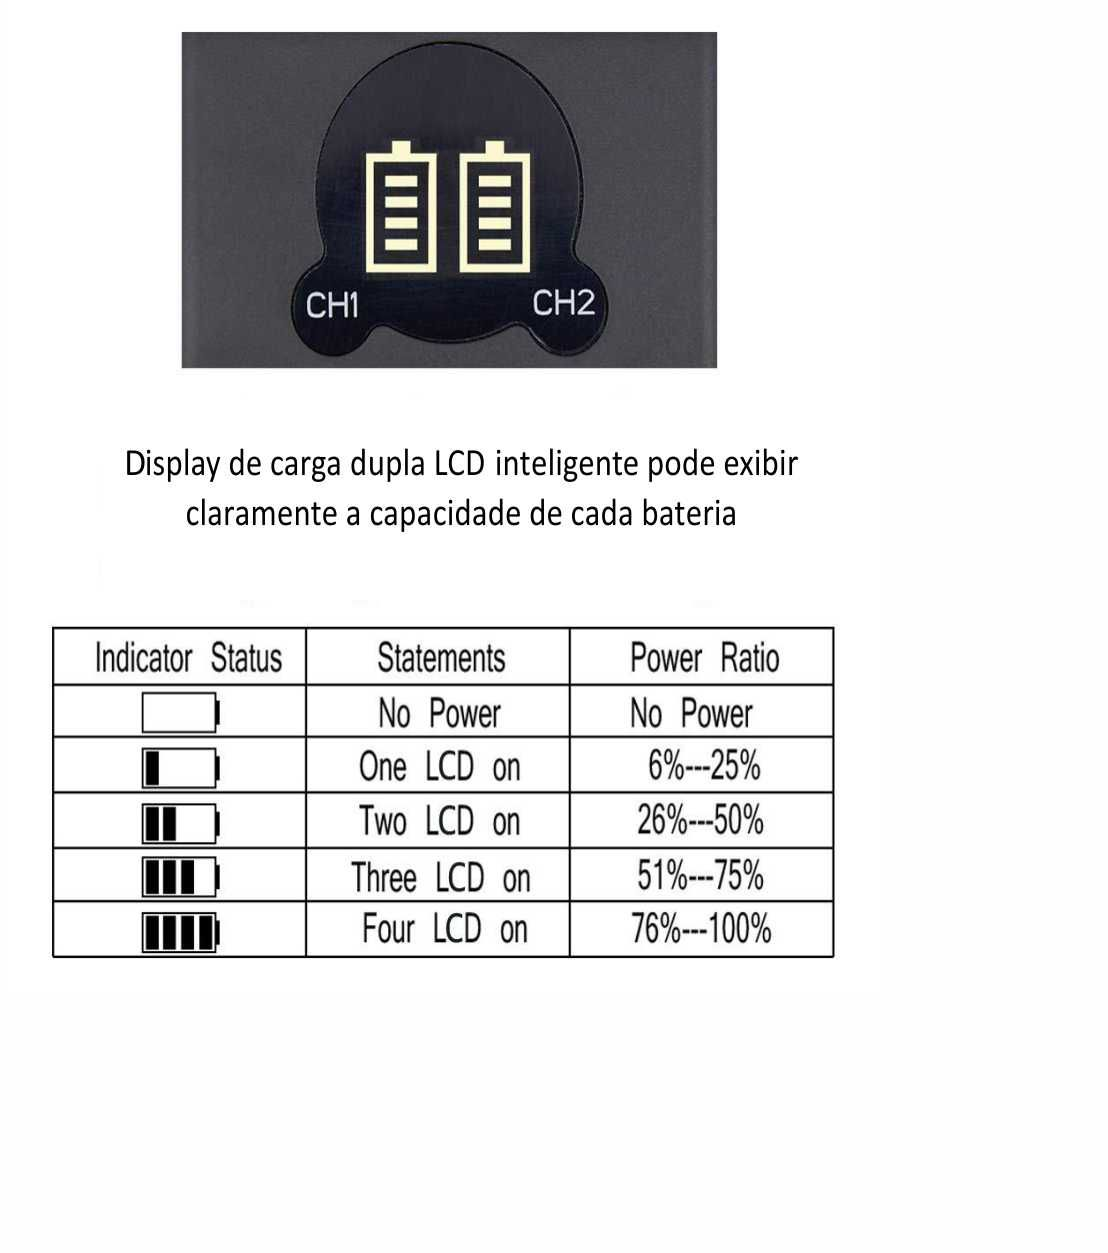 2 Baterias + Duplo Carregador DMW-BLF19 para PANAsonic